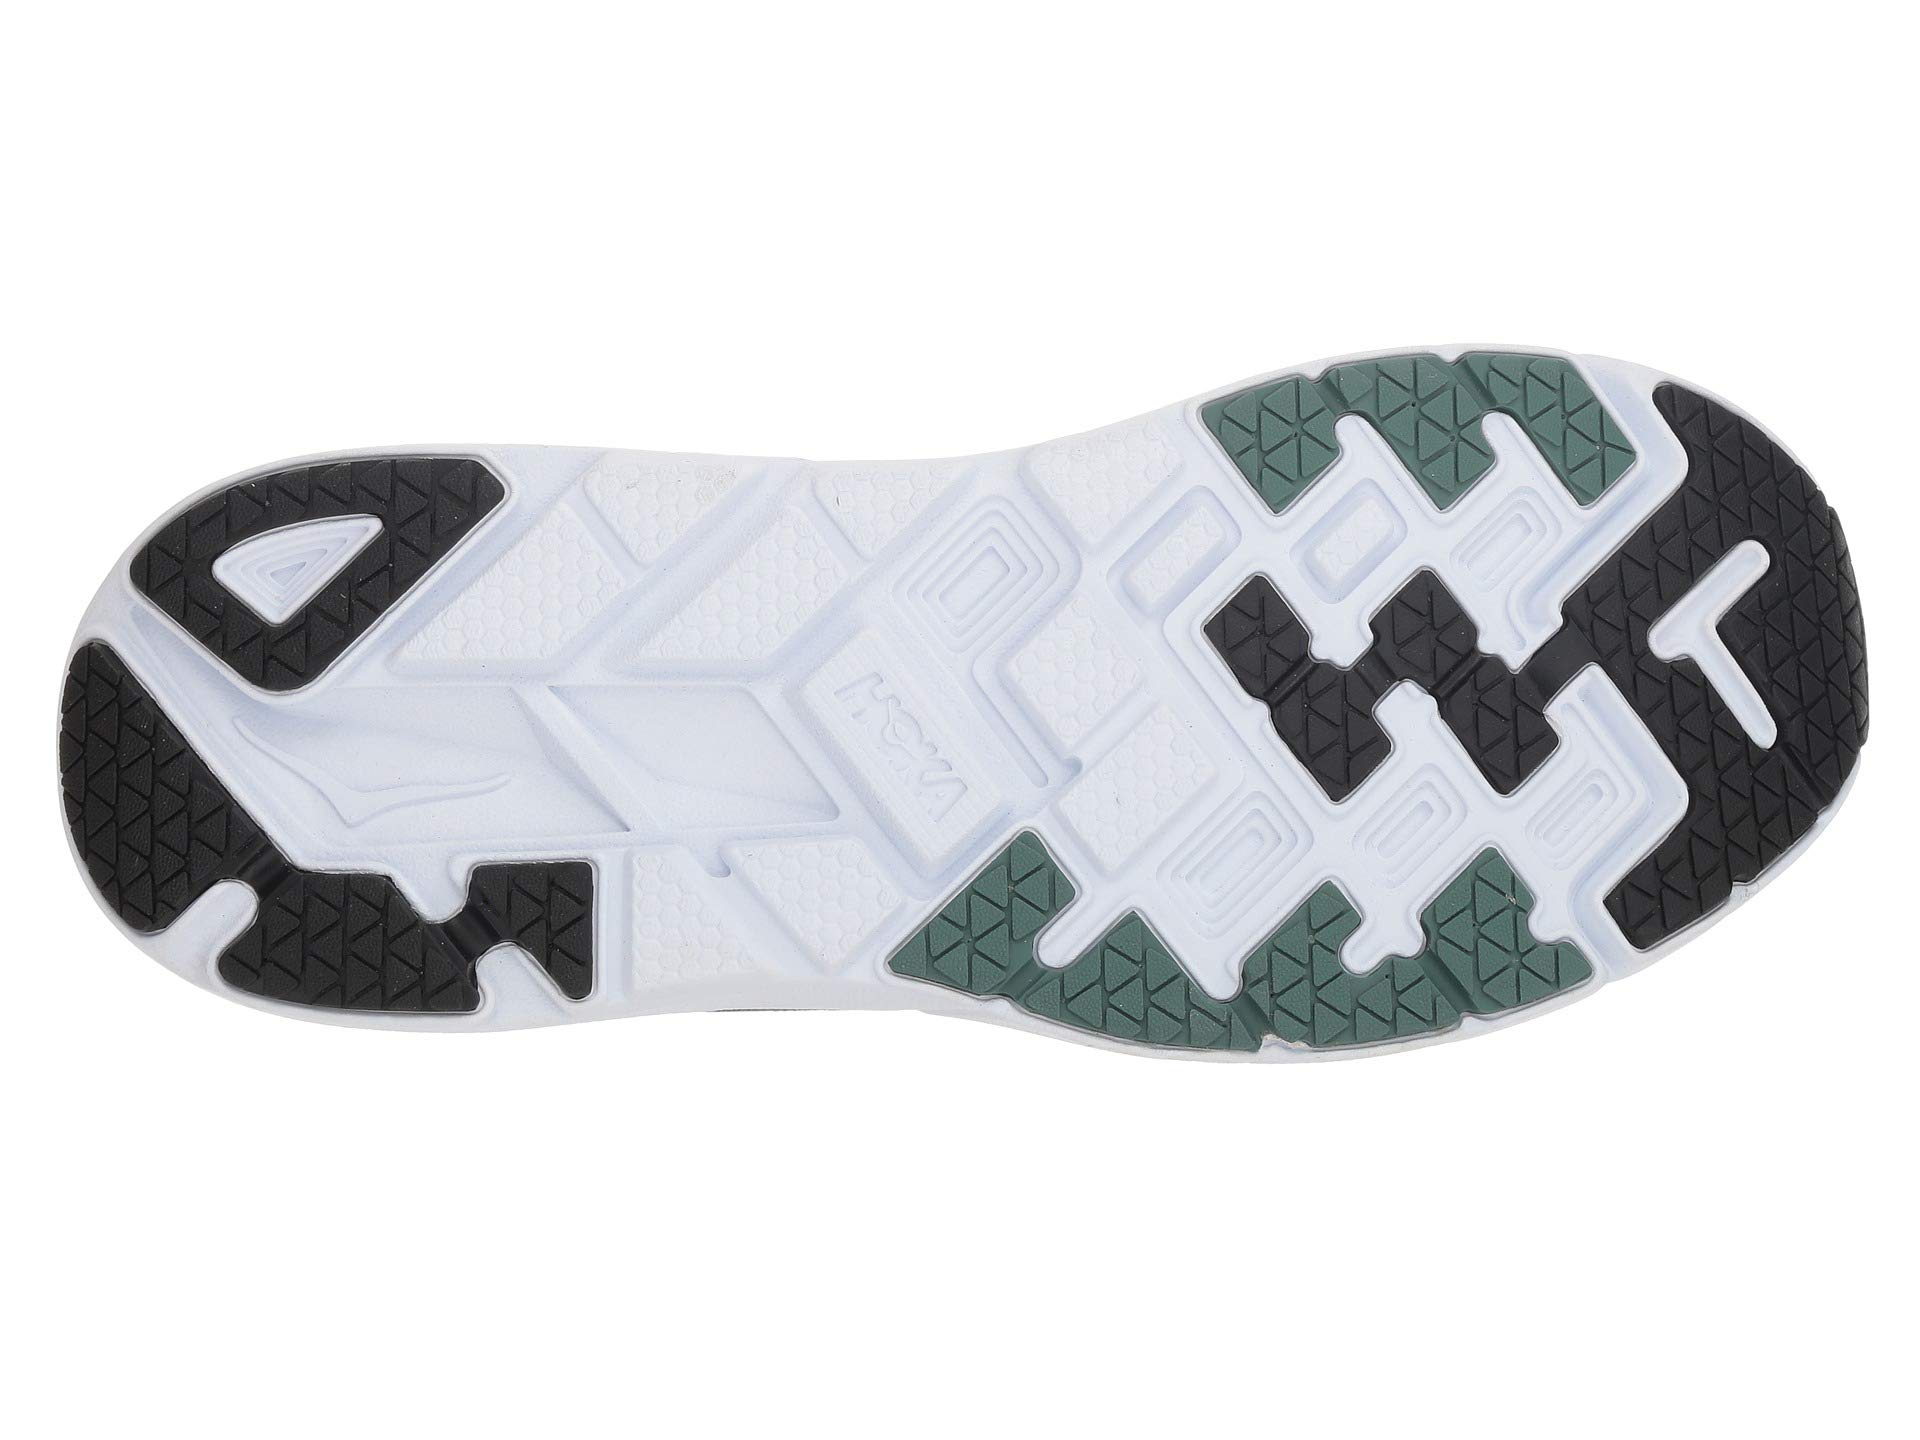 Pine Green One Hoka Silver chinois 5 Knit Clifton w8n7RXSq